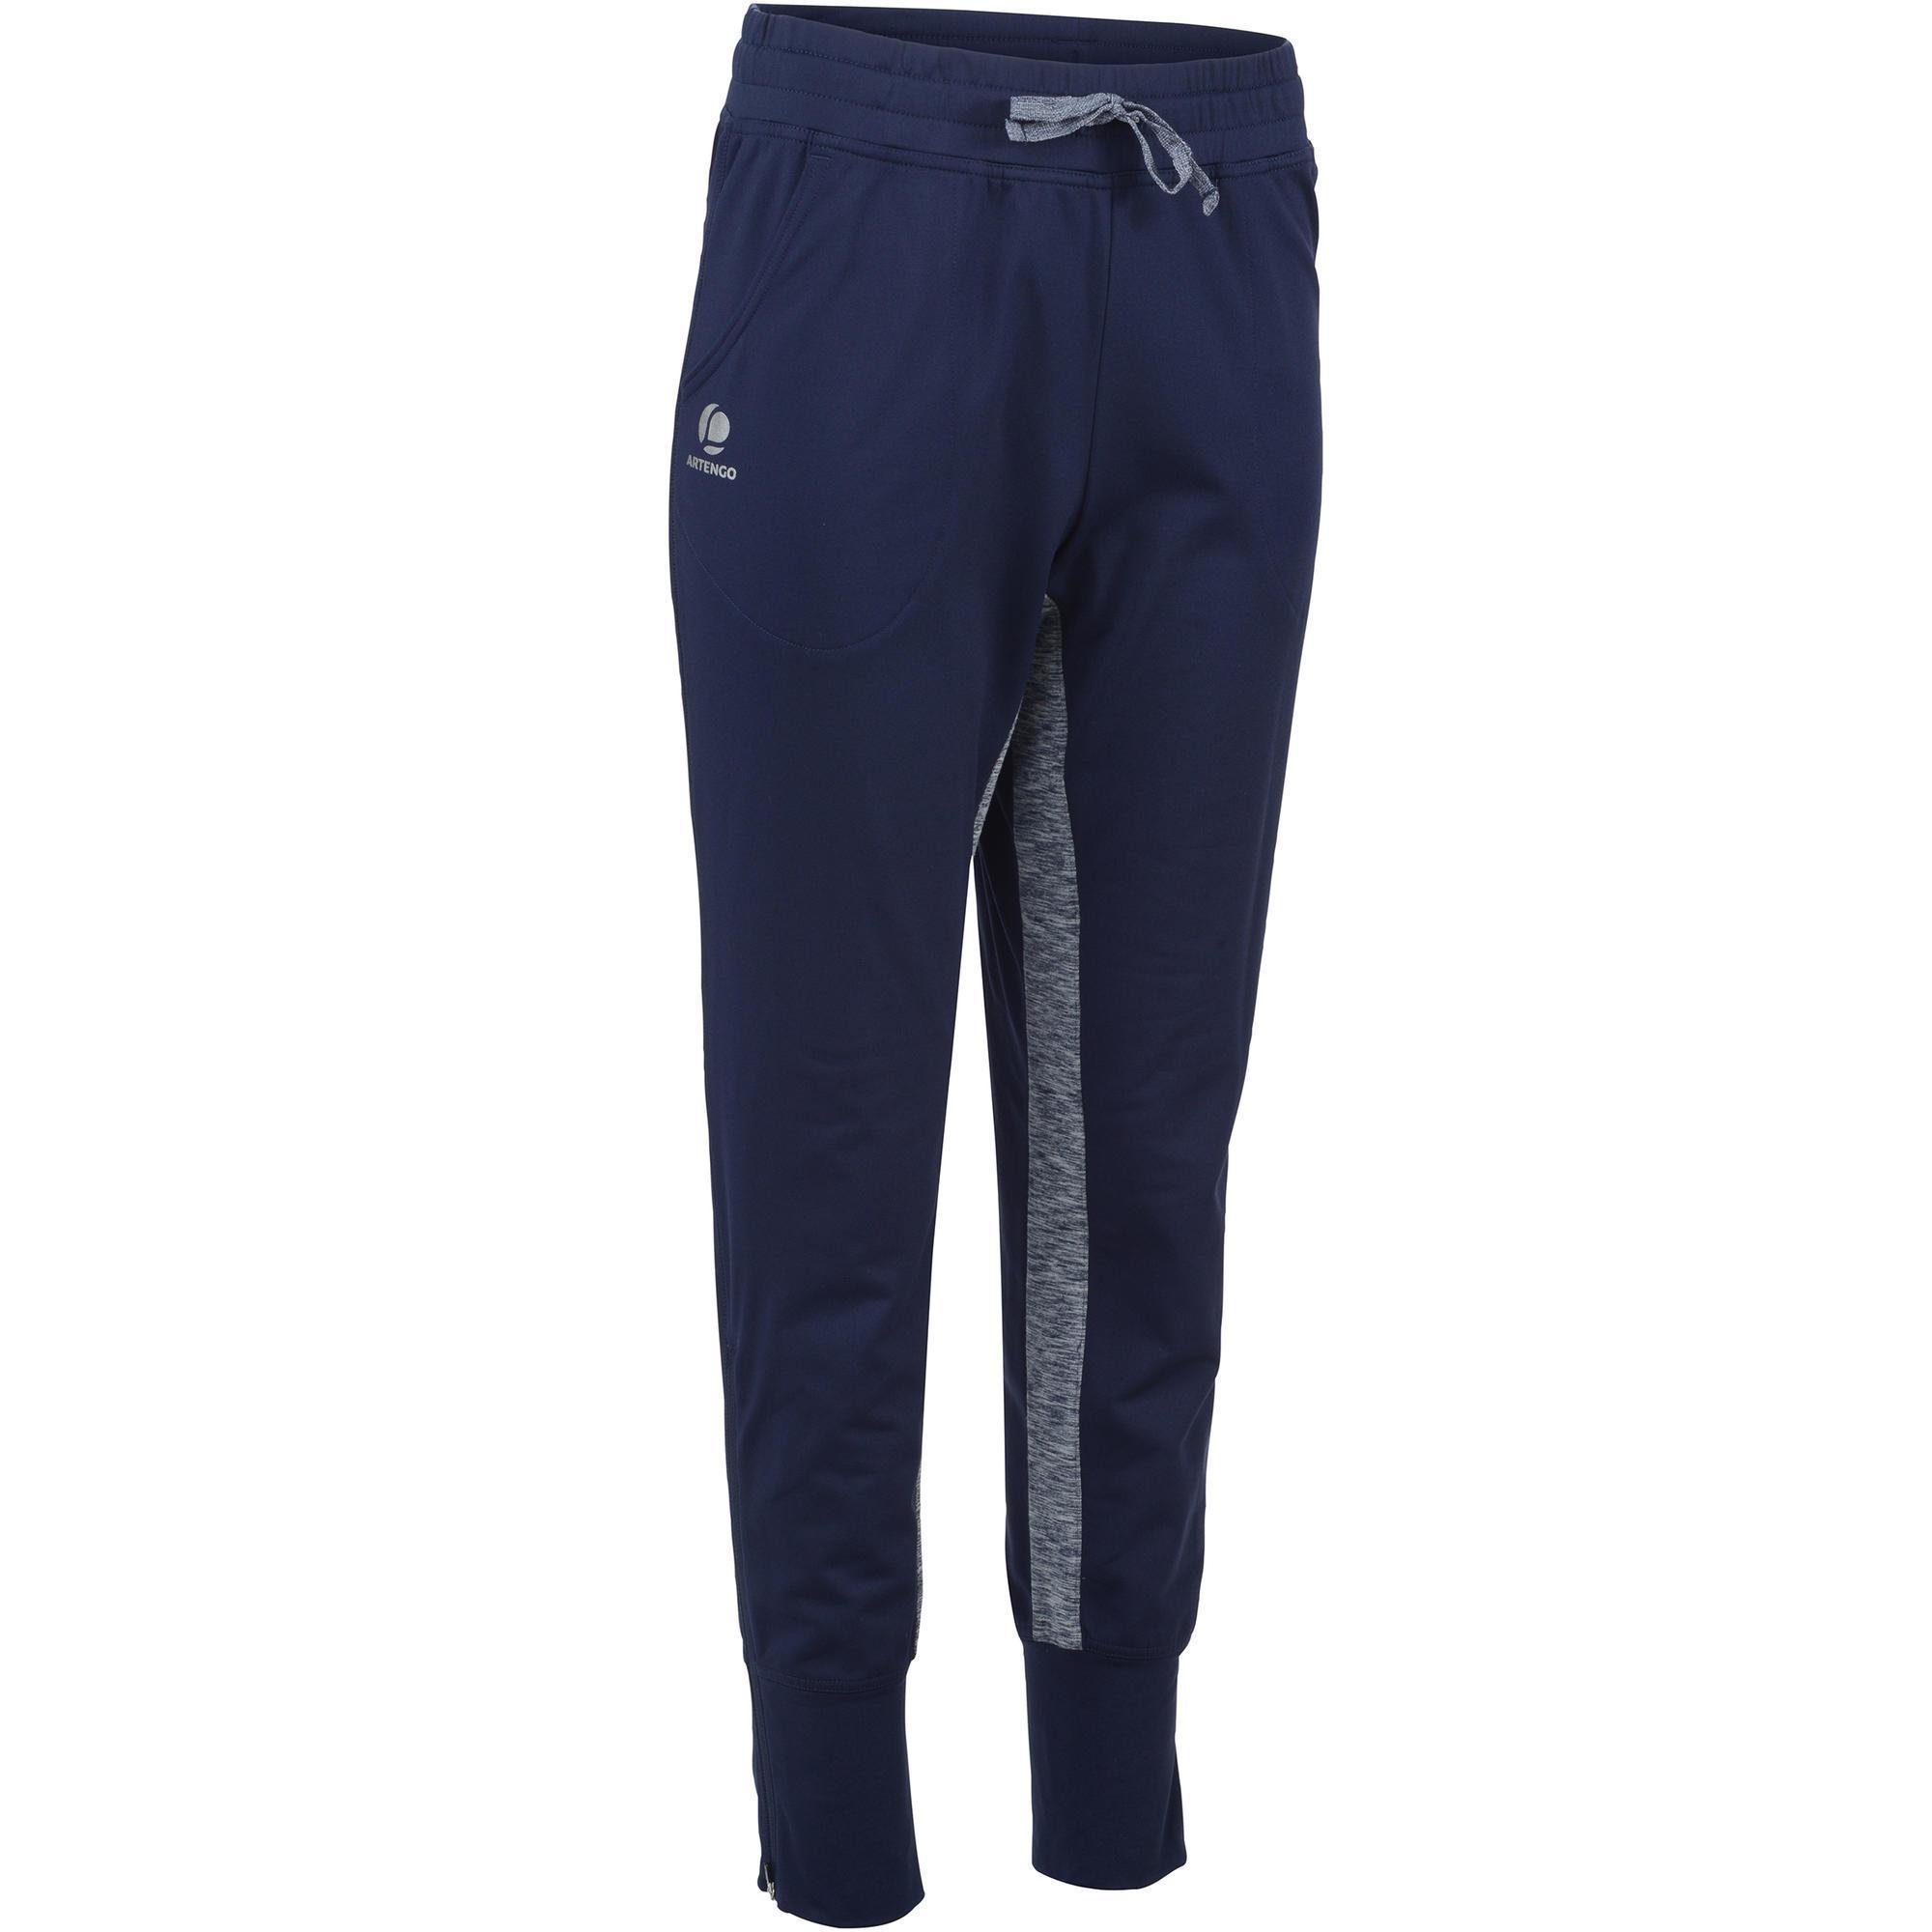 Tennishose Trainingshose Warm 500 Tennis Damen marineblau | Sportbekleidung > Sporthosen > Tennisshorts | Blau | Artengo